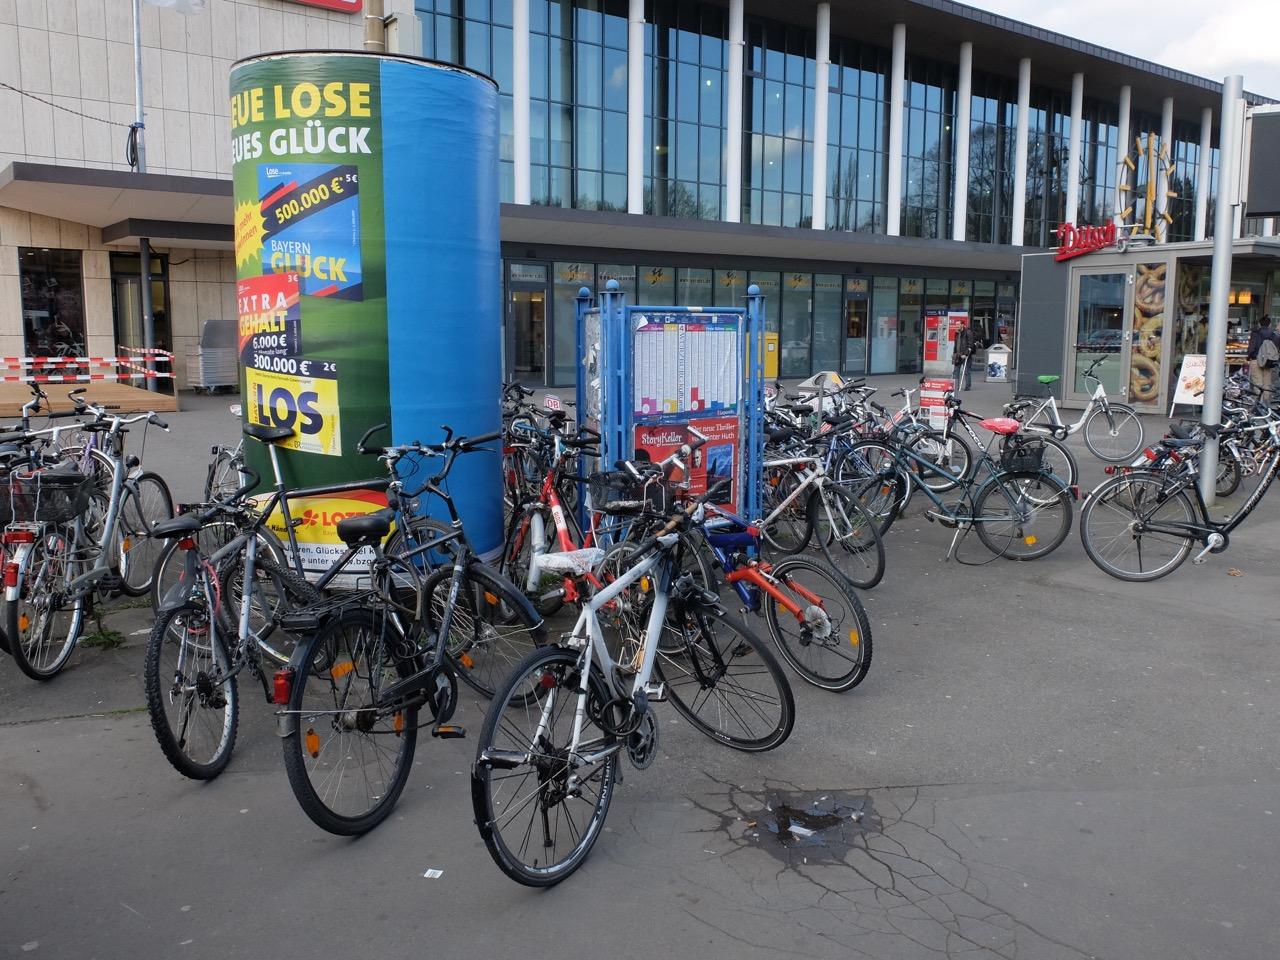 Fahrrad parken am Würzburger Hauptbahnhof